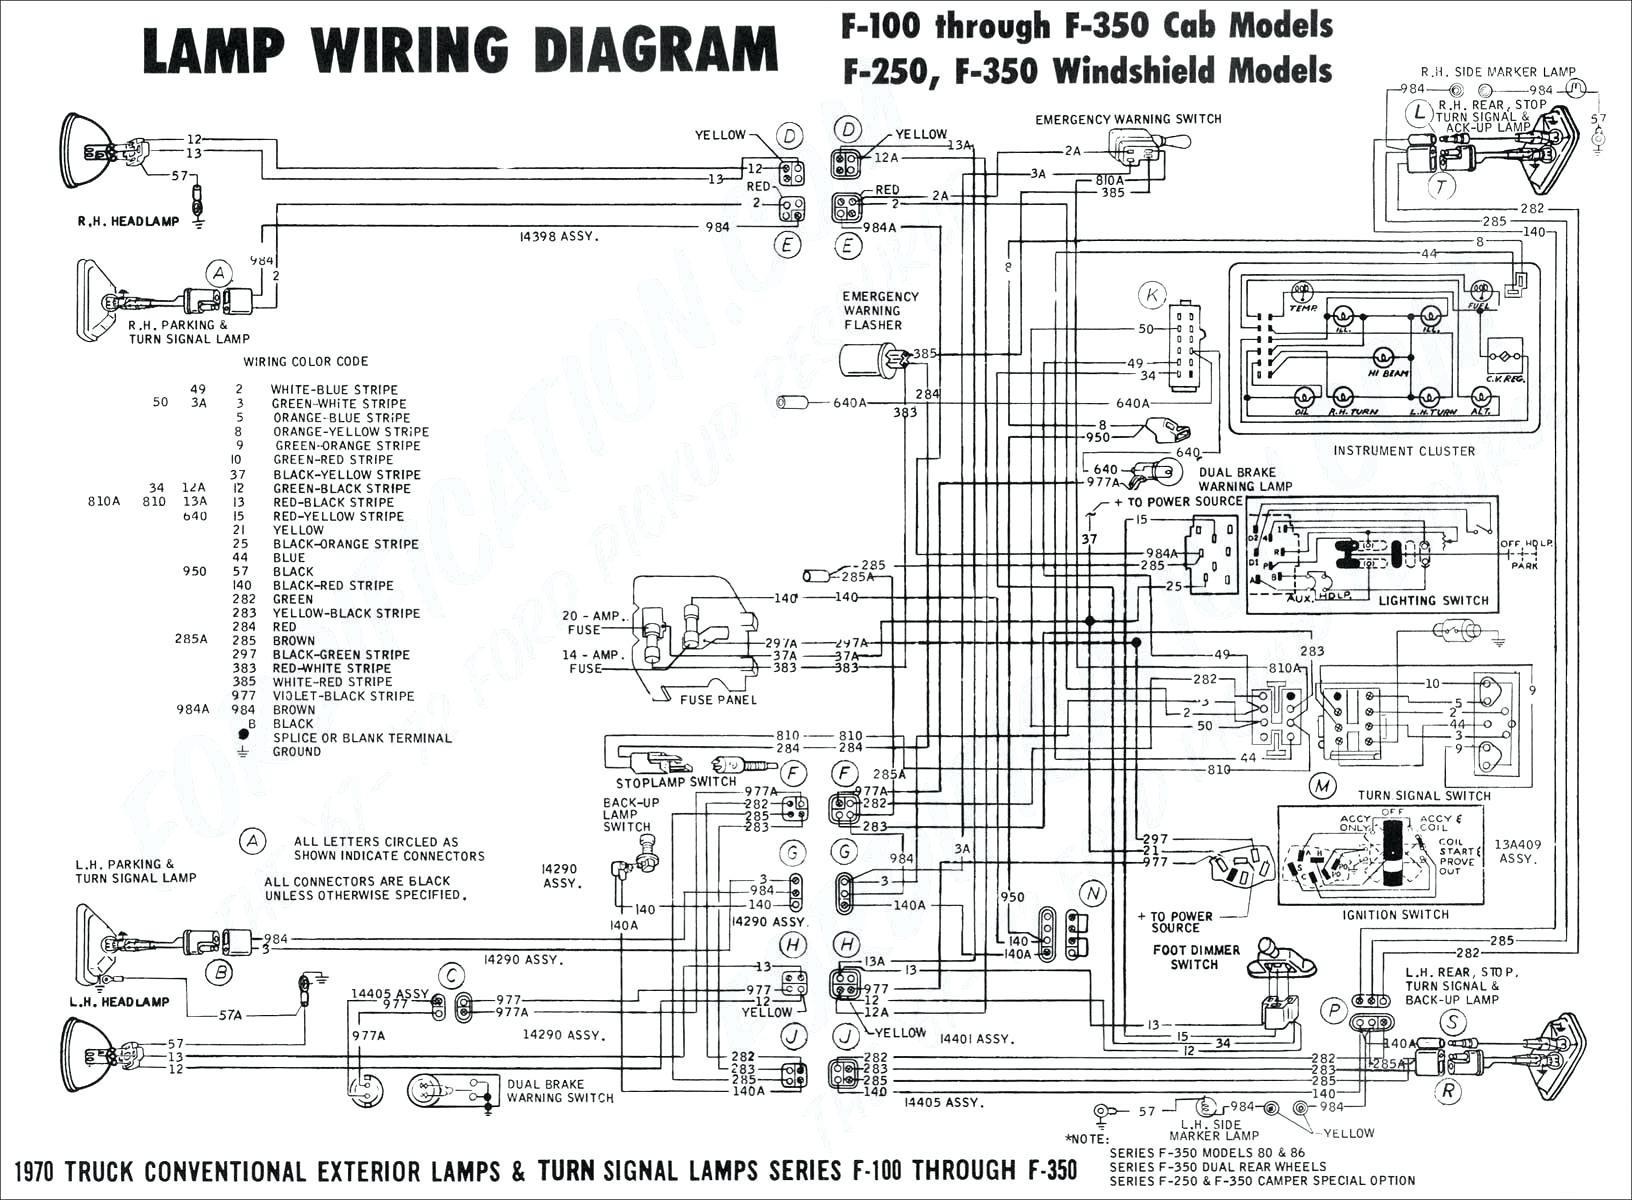 7 3 L Powerstroke Engine Diagram 2001 ford 7 3 Liter sel ...  Ford Powerstroke Glow Plug Relay Wiring on